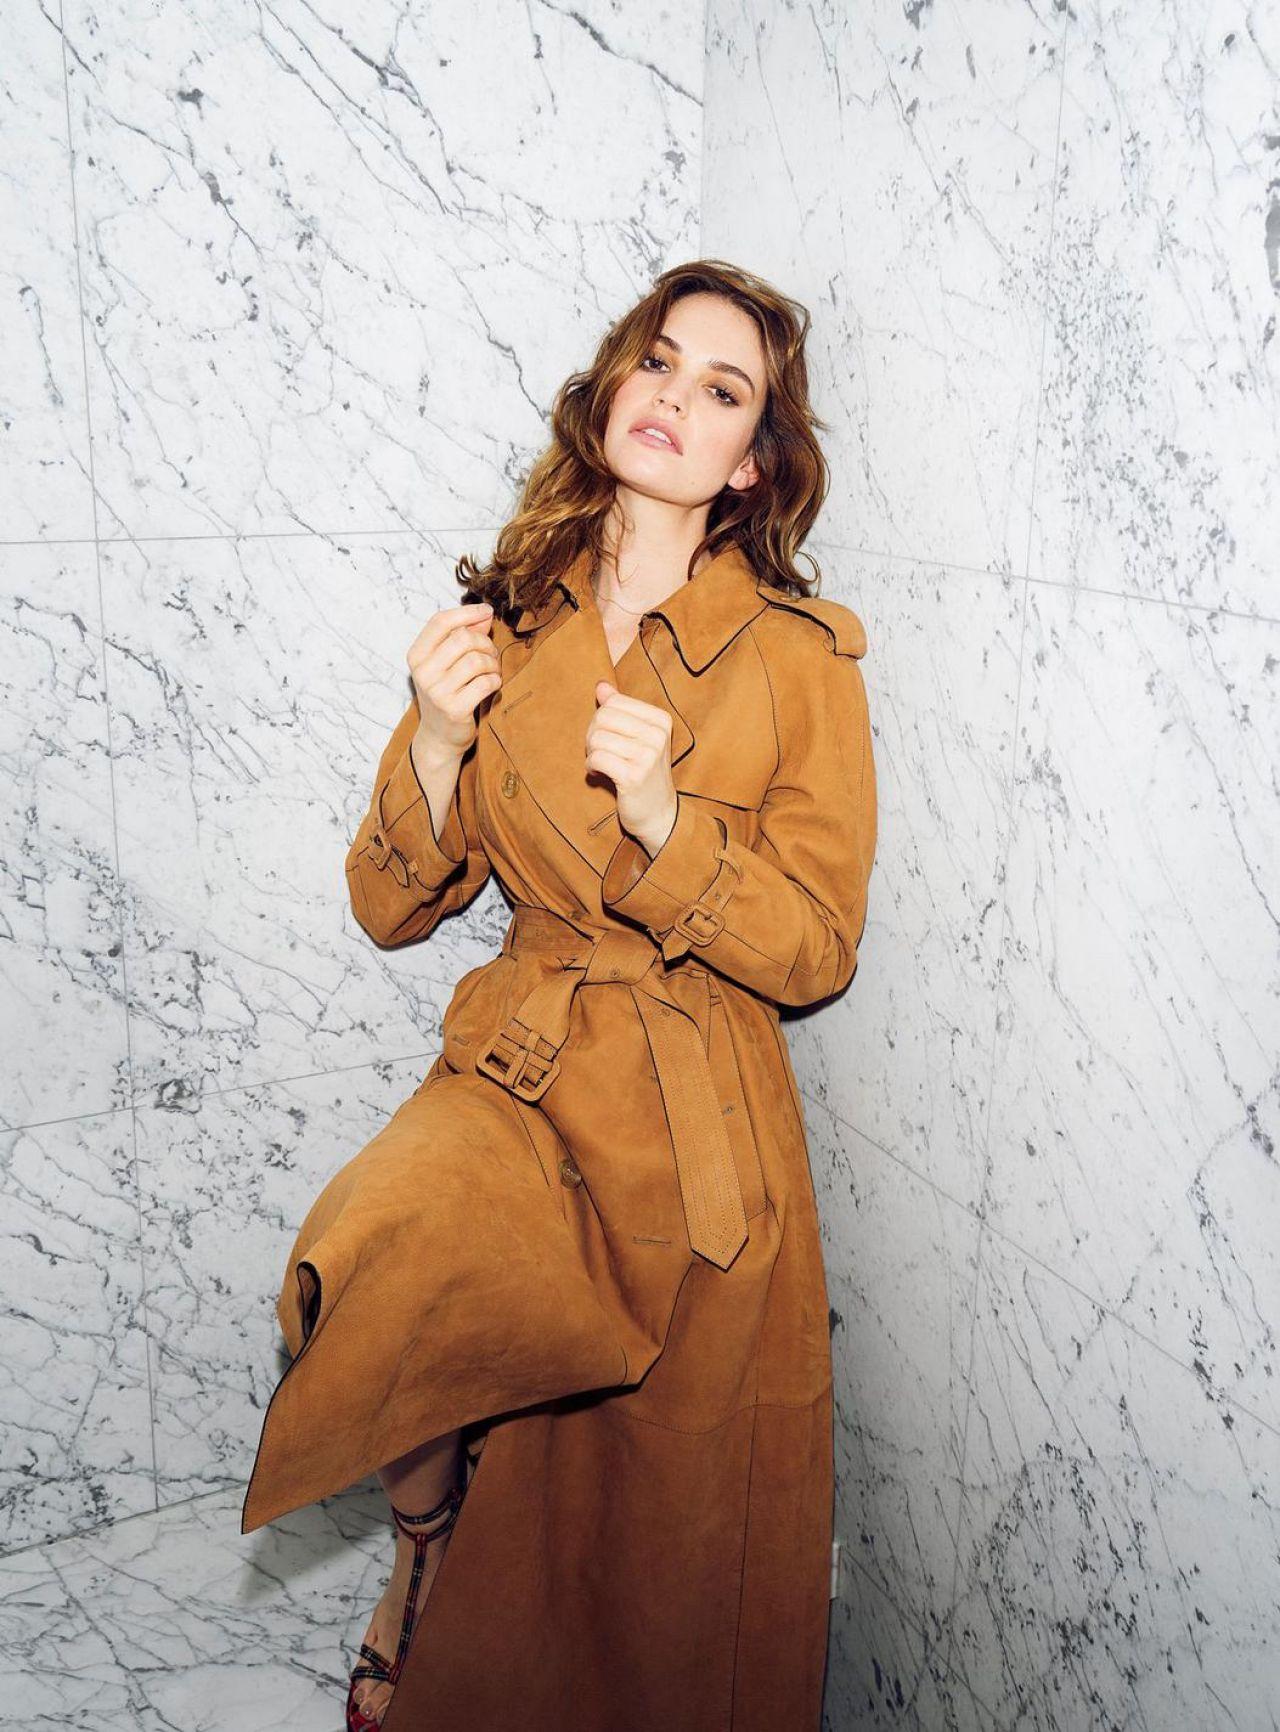 Lily James - Madame Figaro Photoshoot 2017